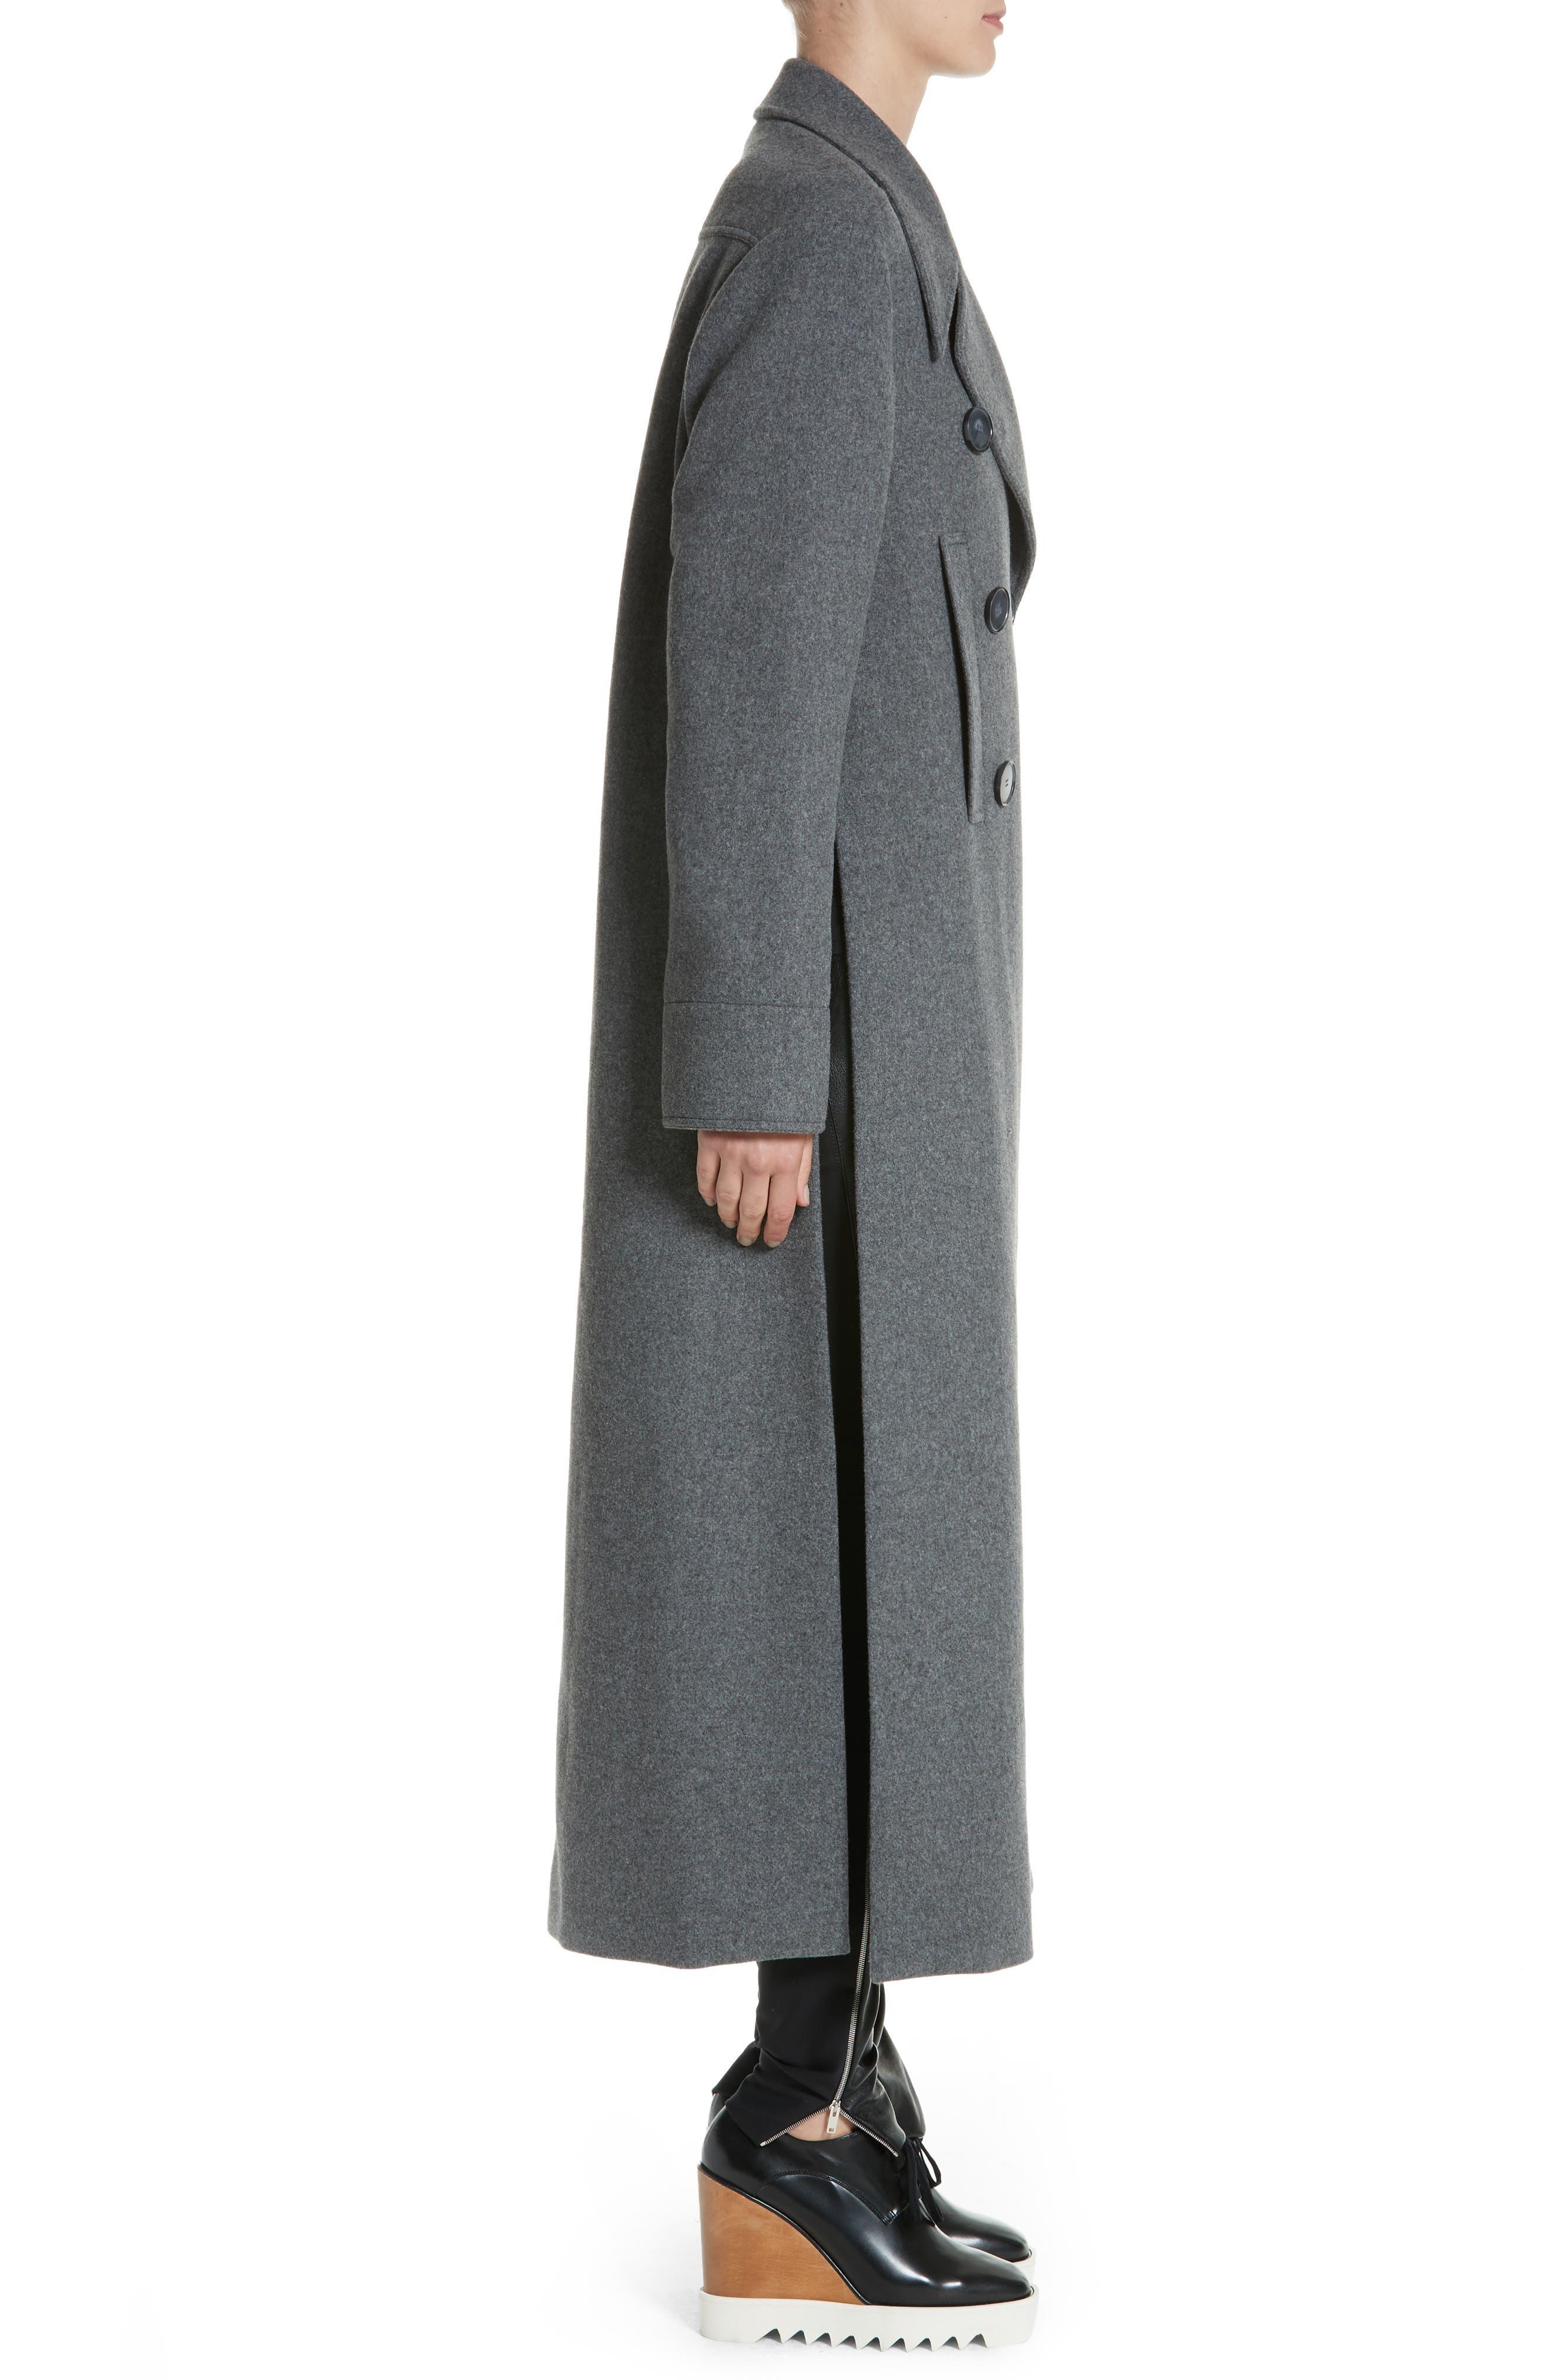 Edwina Long Double Breasted Wool Blend Coat,                             Alternate thumbnail 3, color,                             076